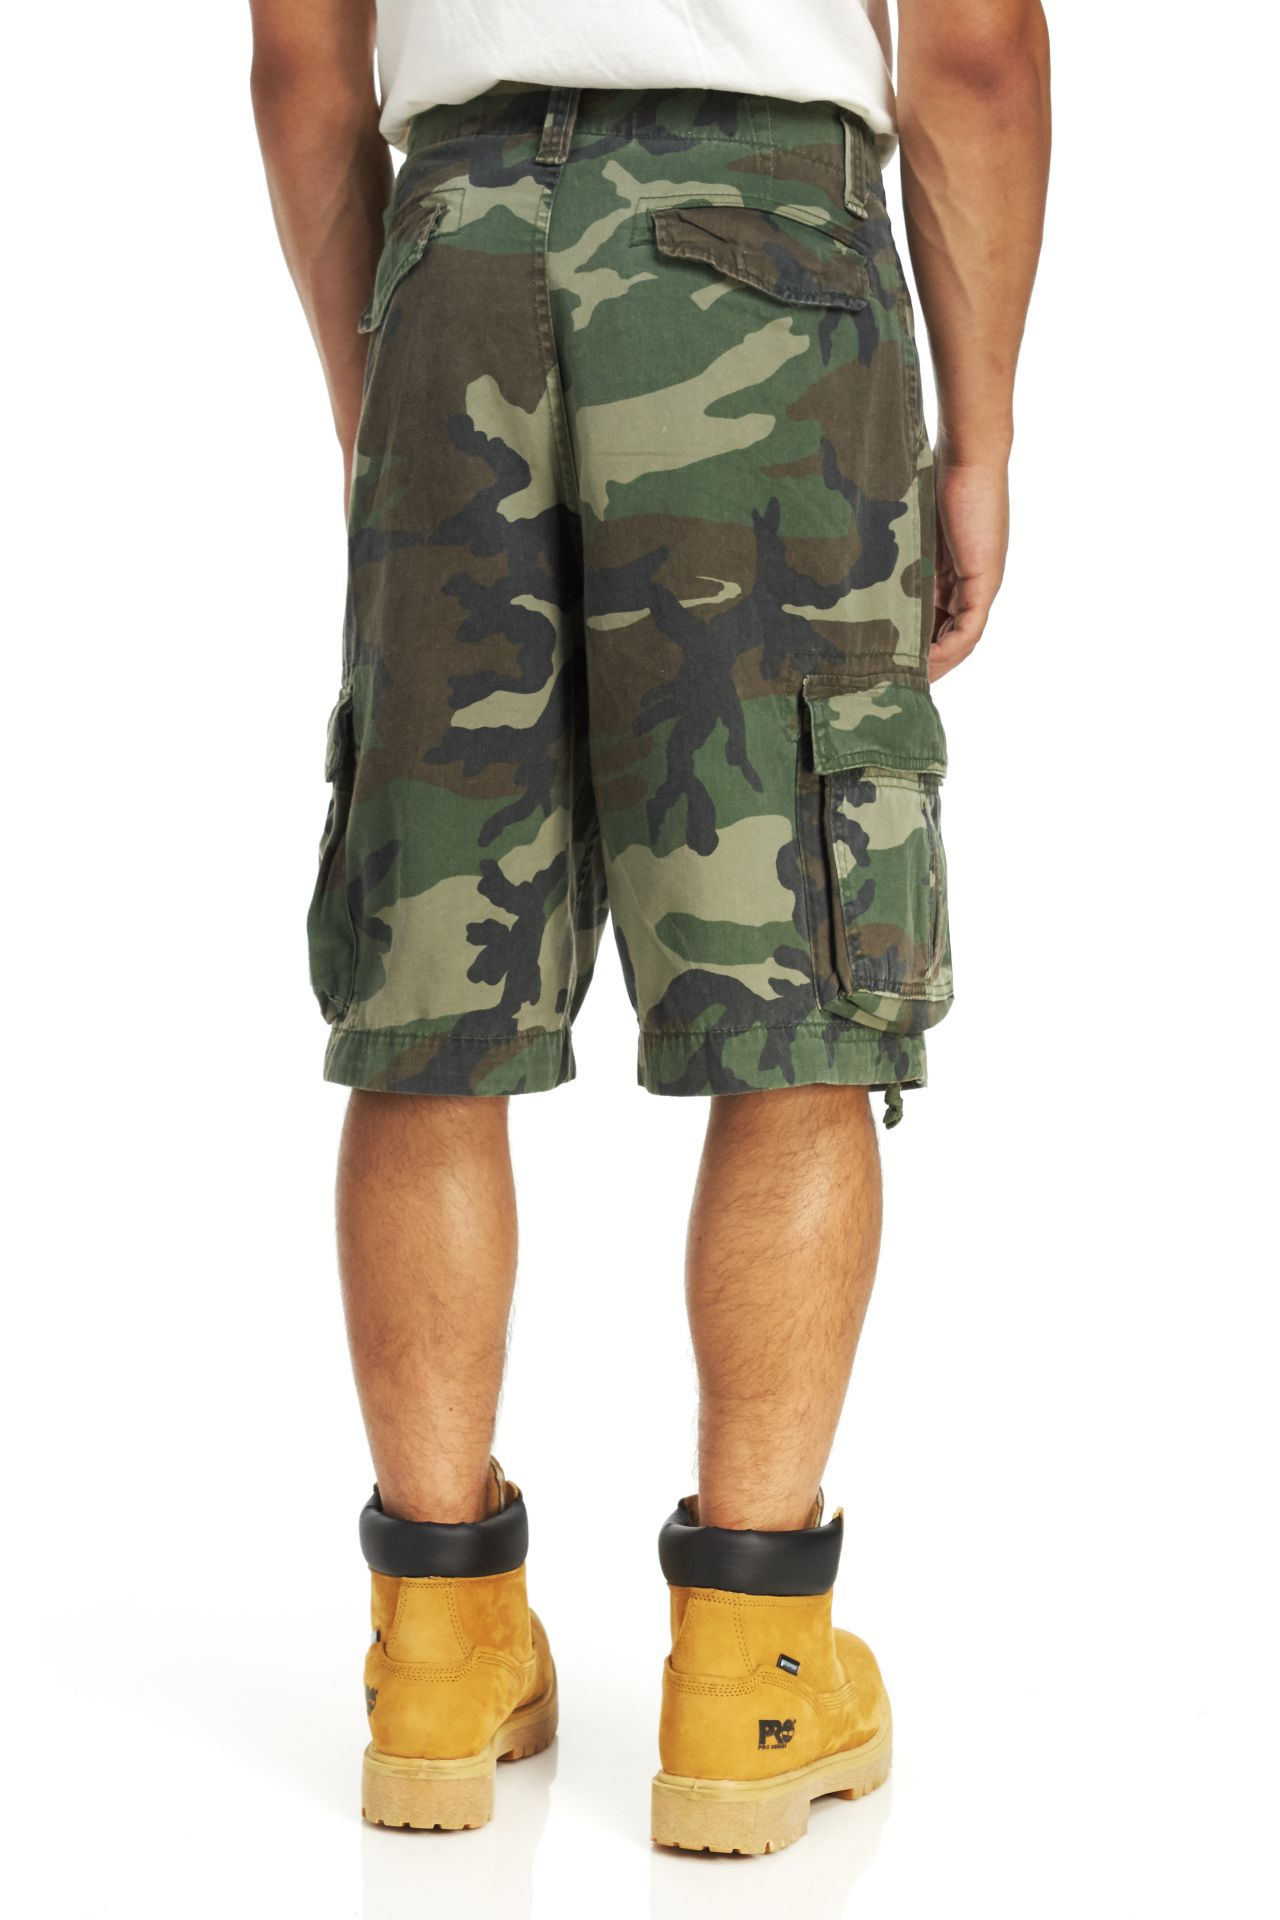 Rothco Woodland Camo Vintage Infantry Utility Shorts 2540